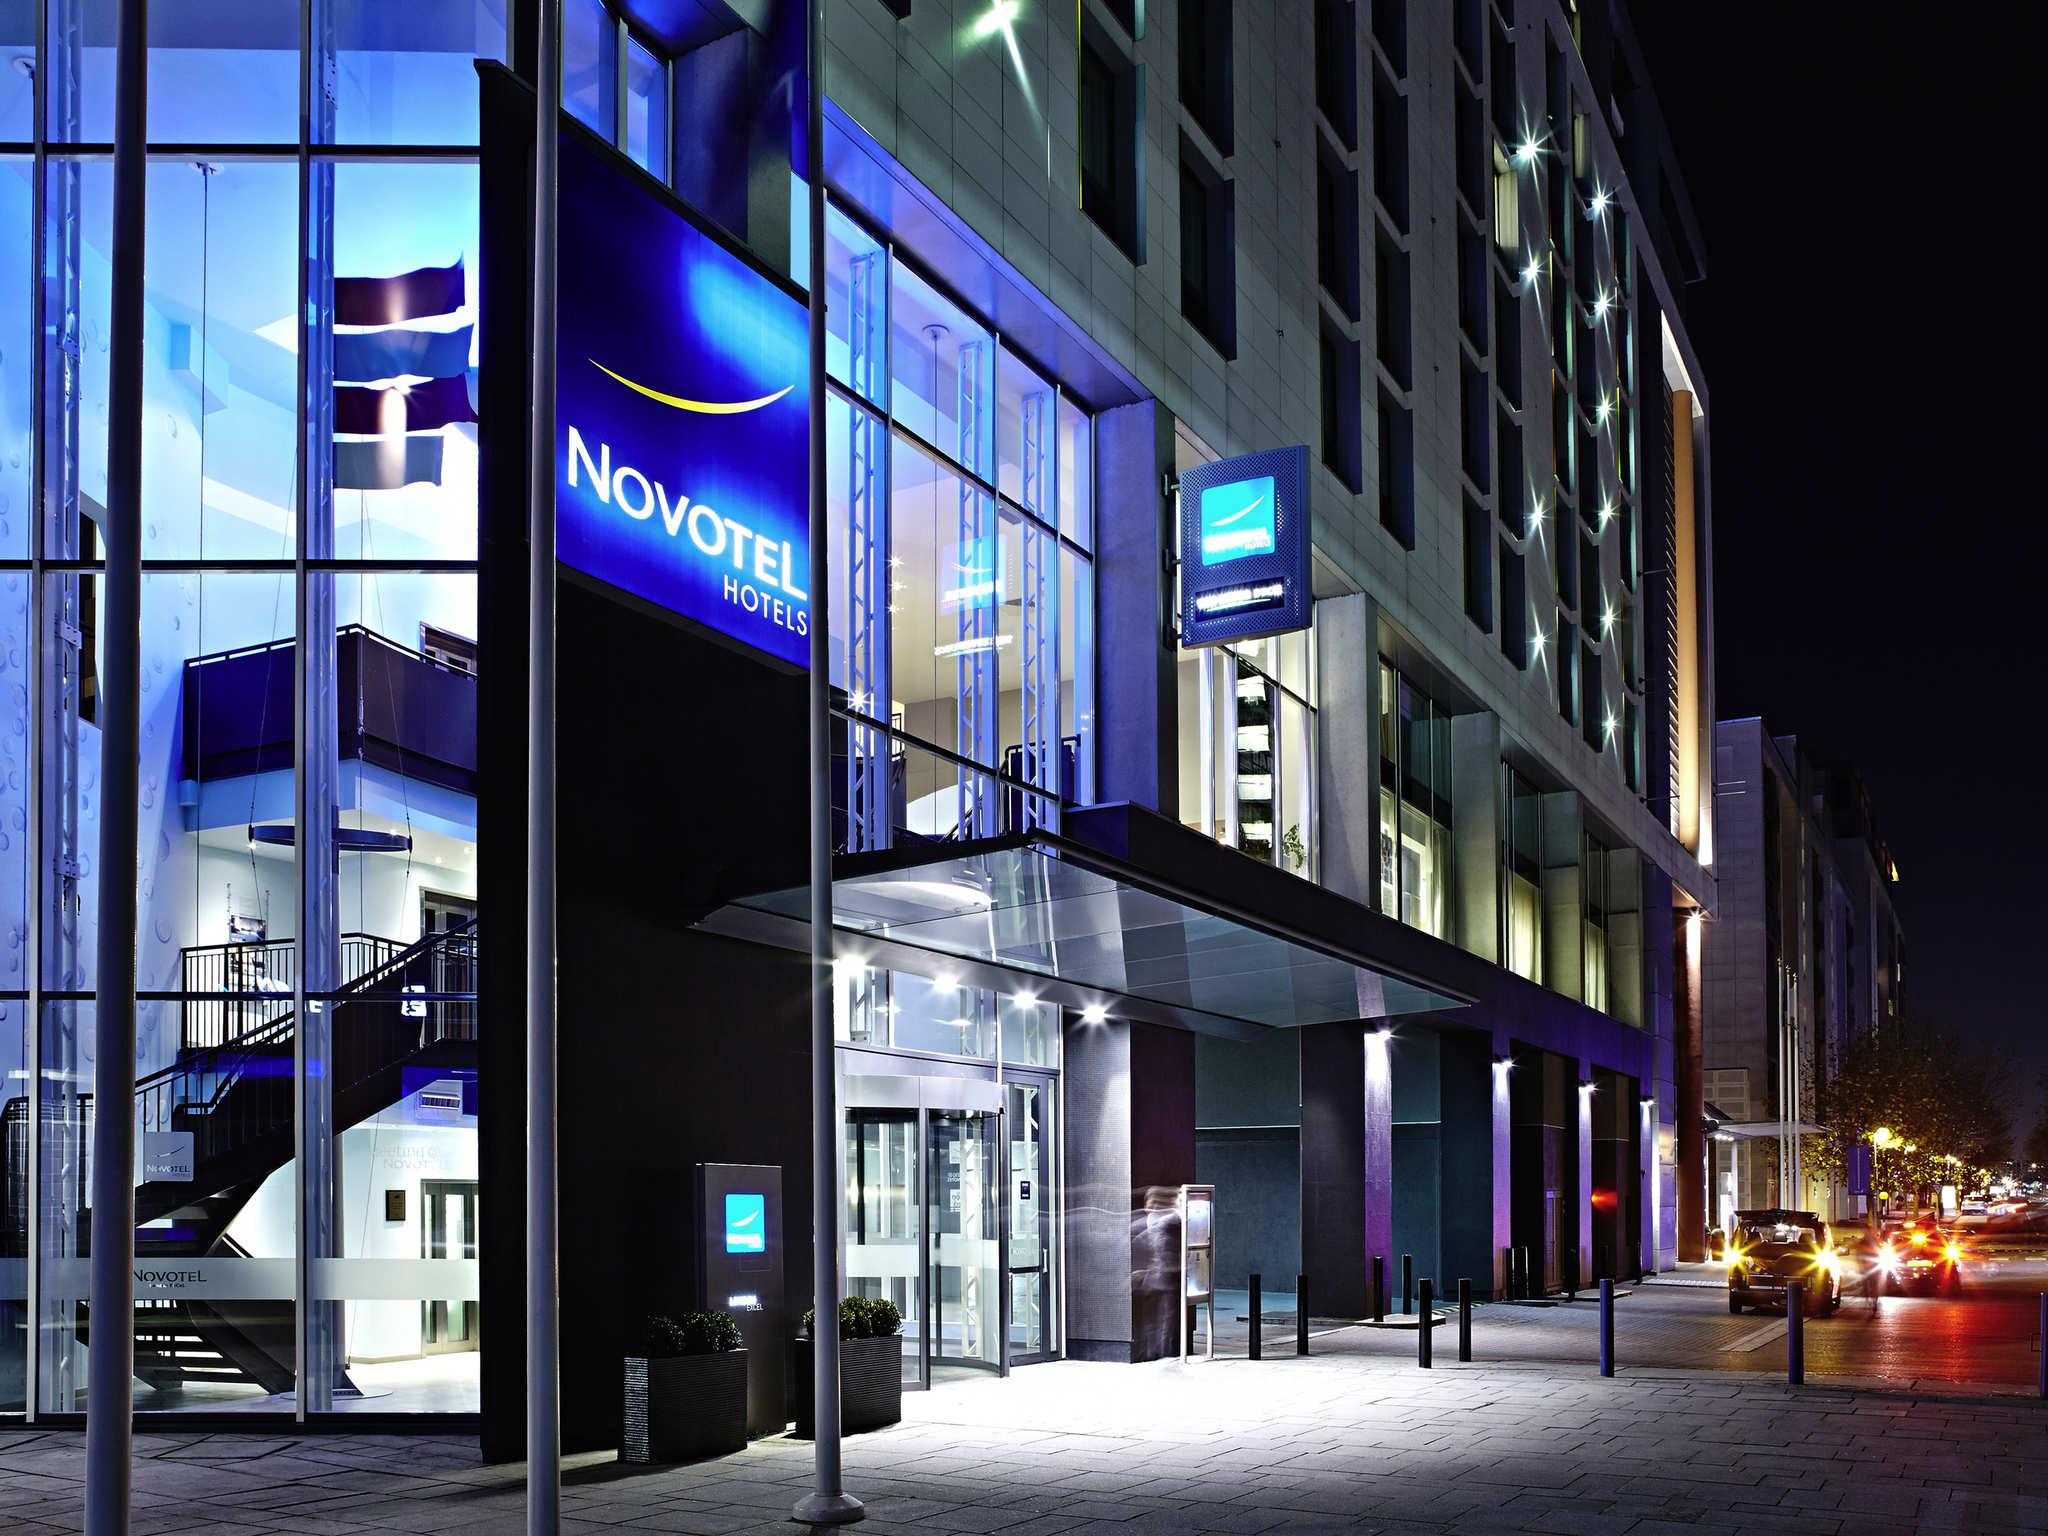 فندق - نوفوتيل NOVOTEL لندن إكسل